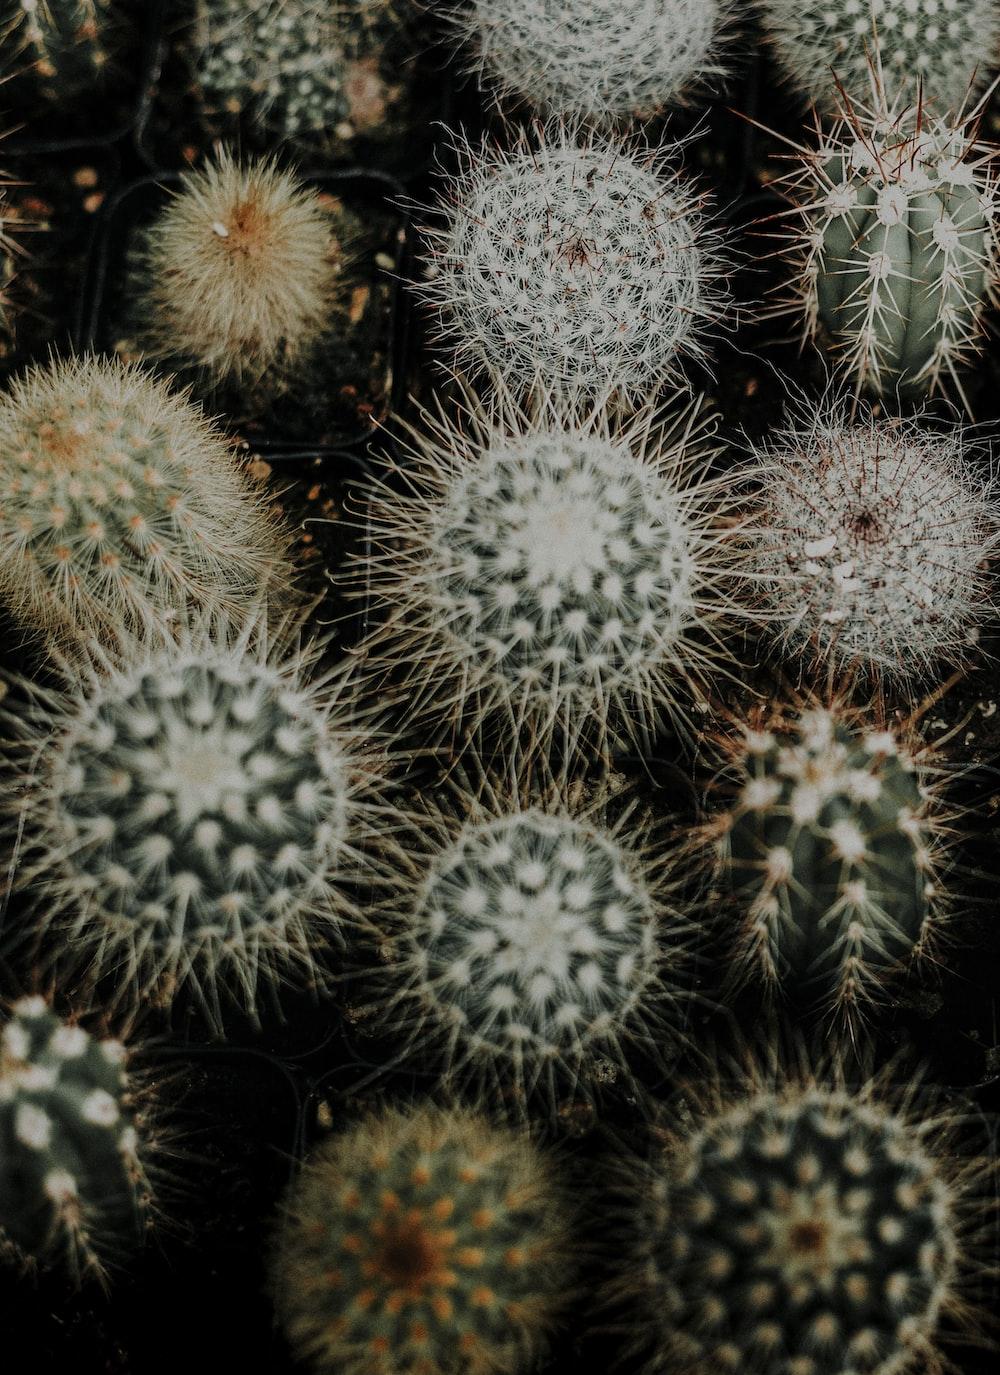 green cactus plant lot